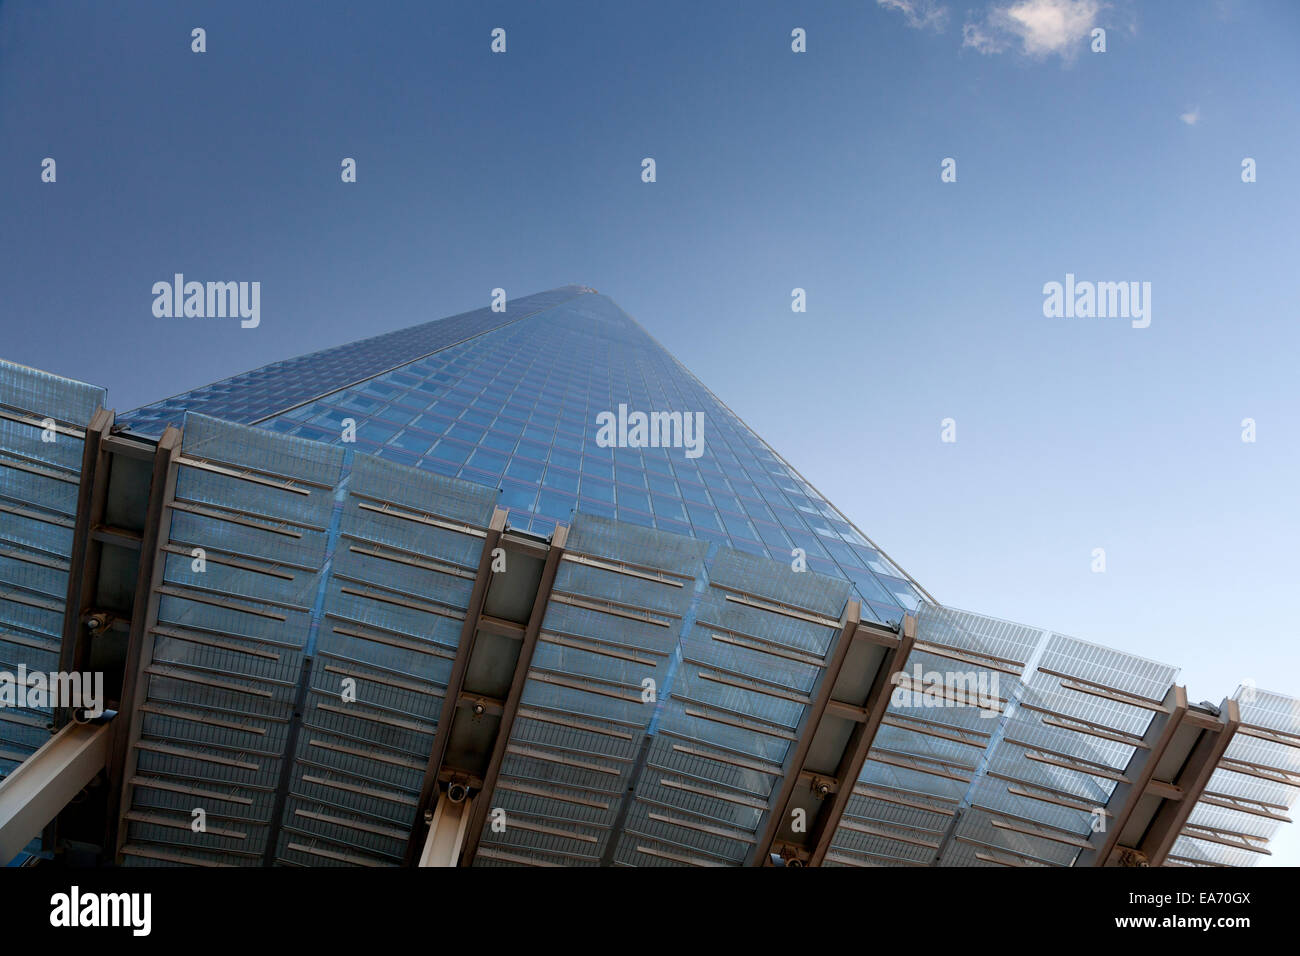 the-shard-southwark-london-EA70GX.jpg